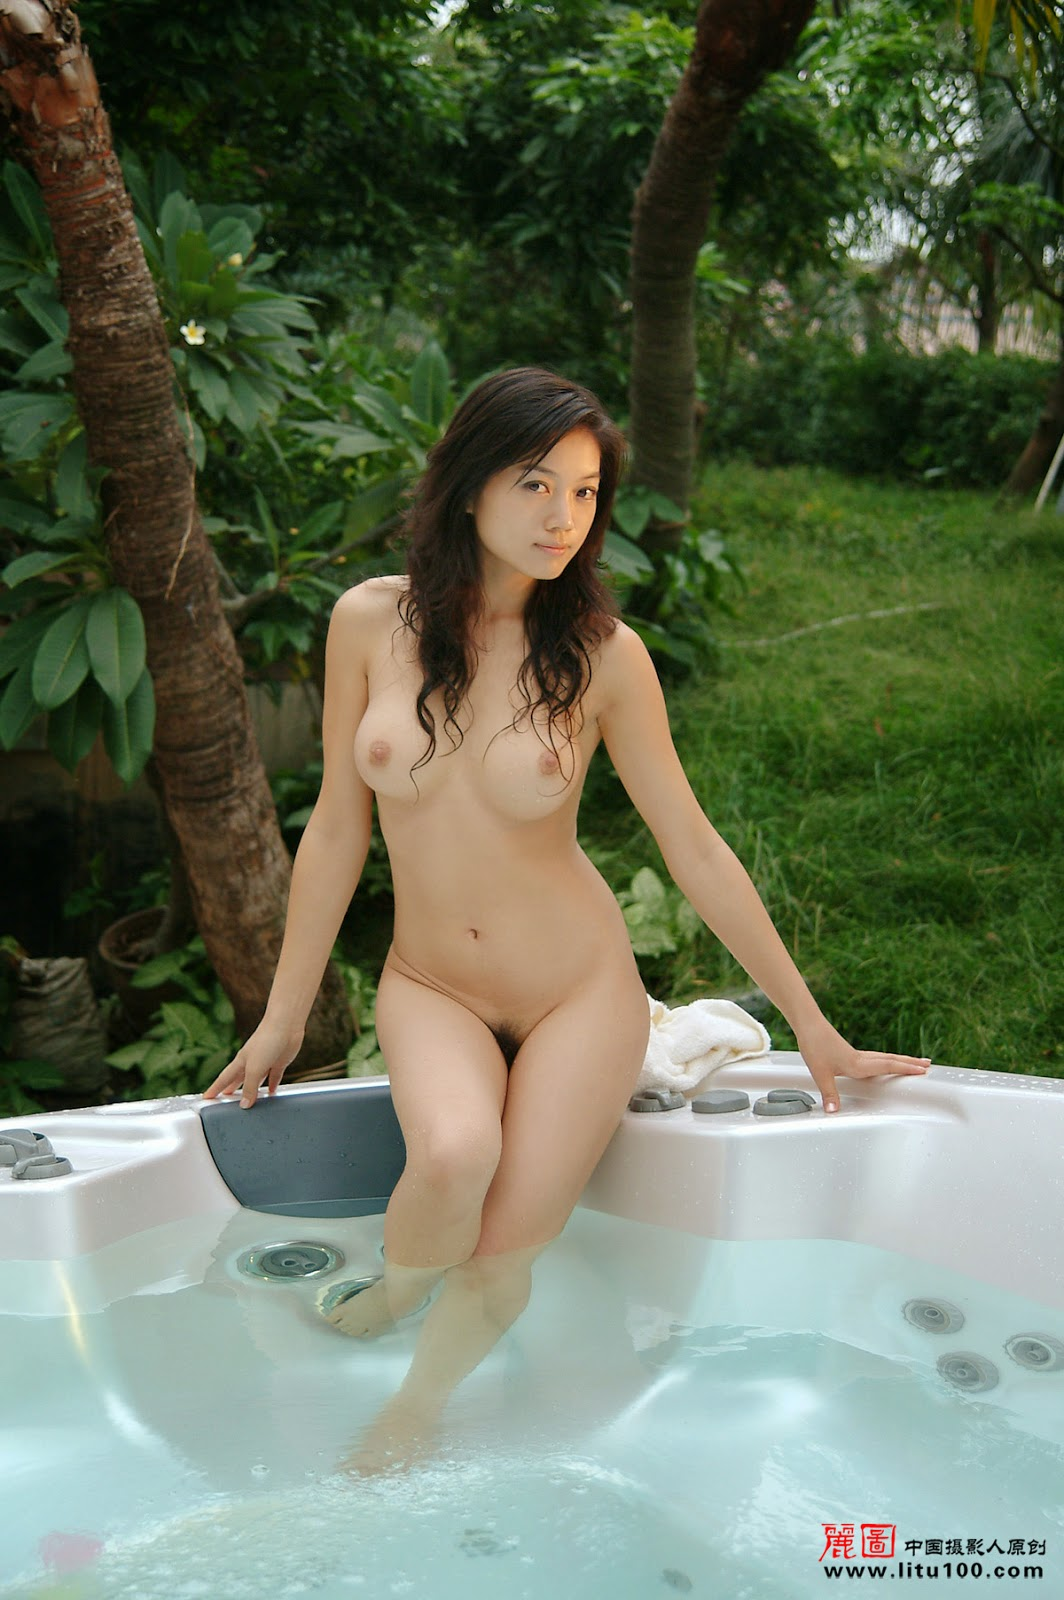 Not understand nude photos modeling girls sri lanka was error